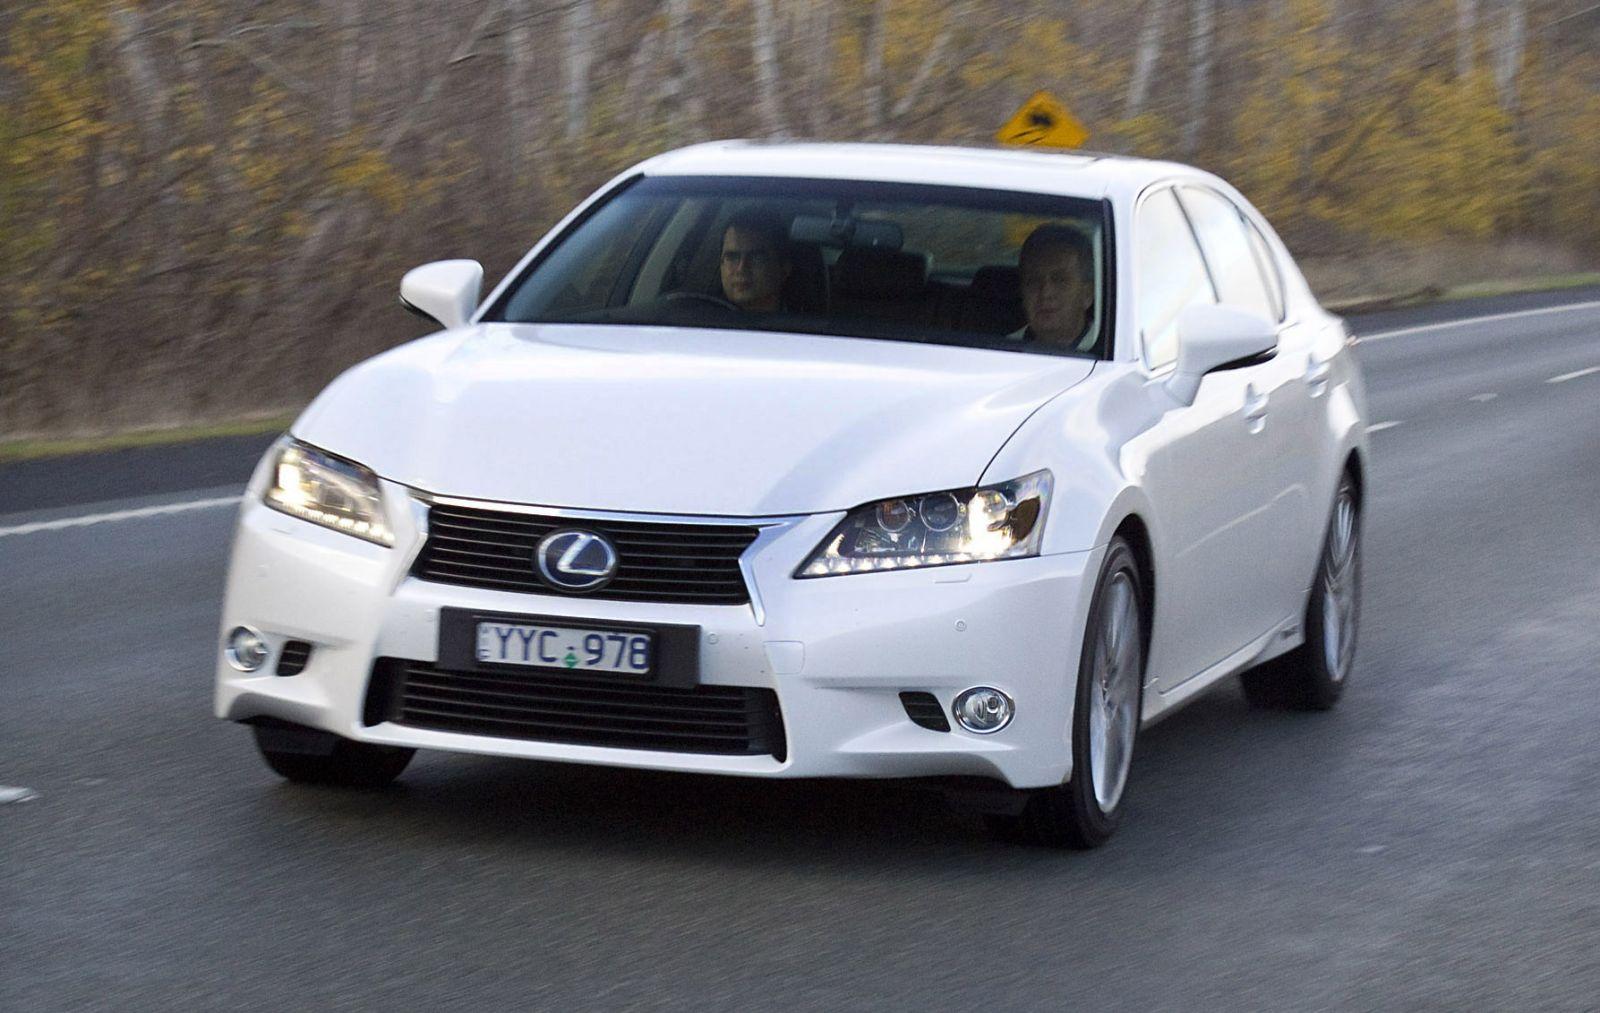 2012 Lexus GS 450h First Drive Review